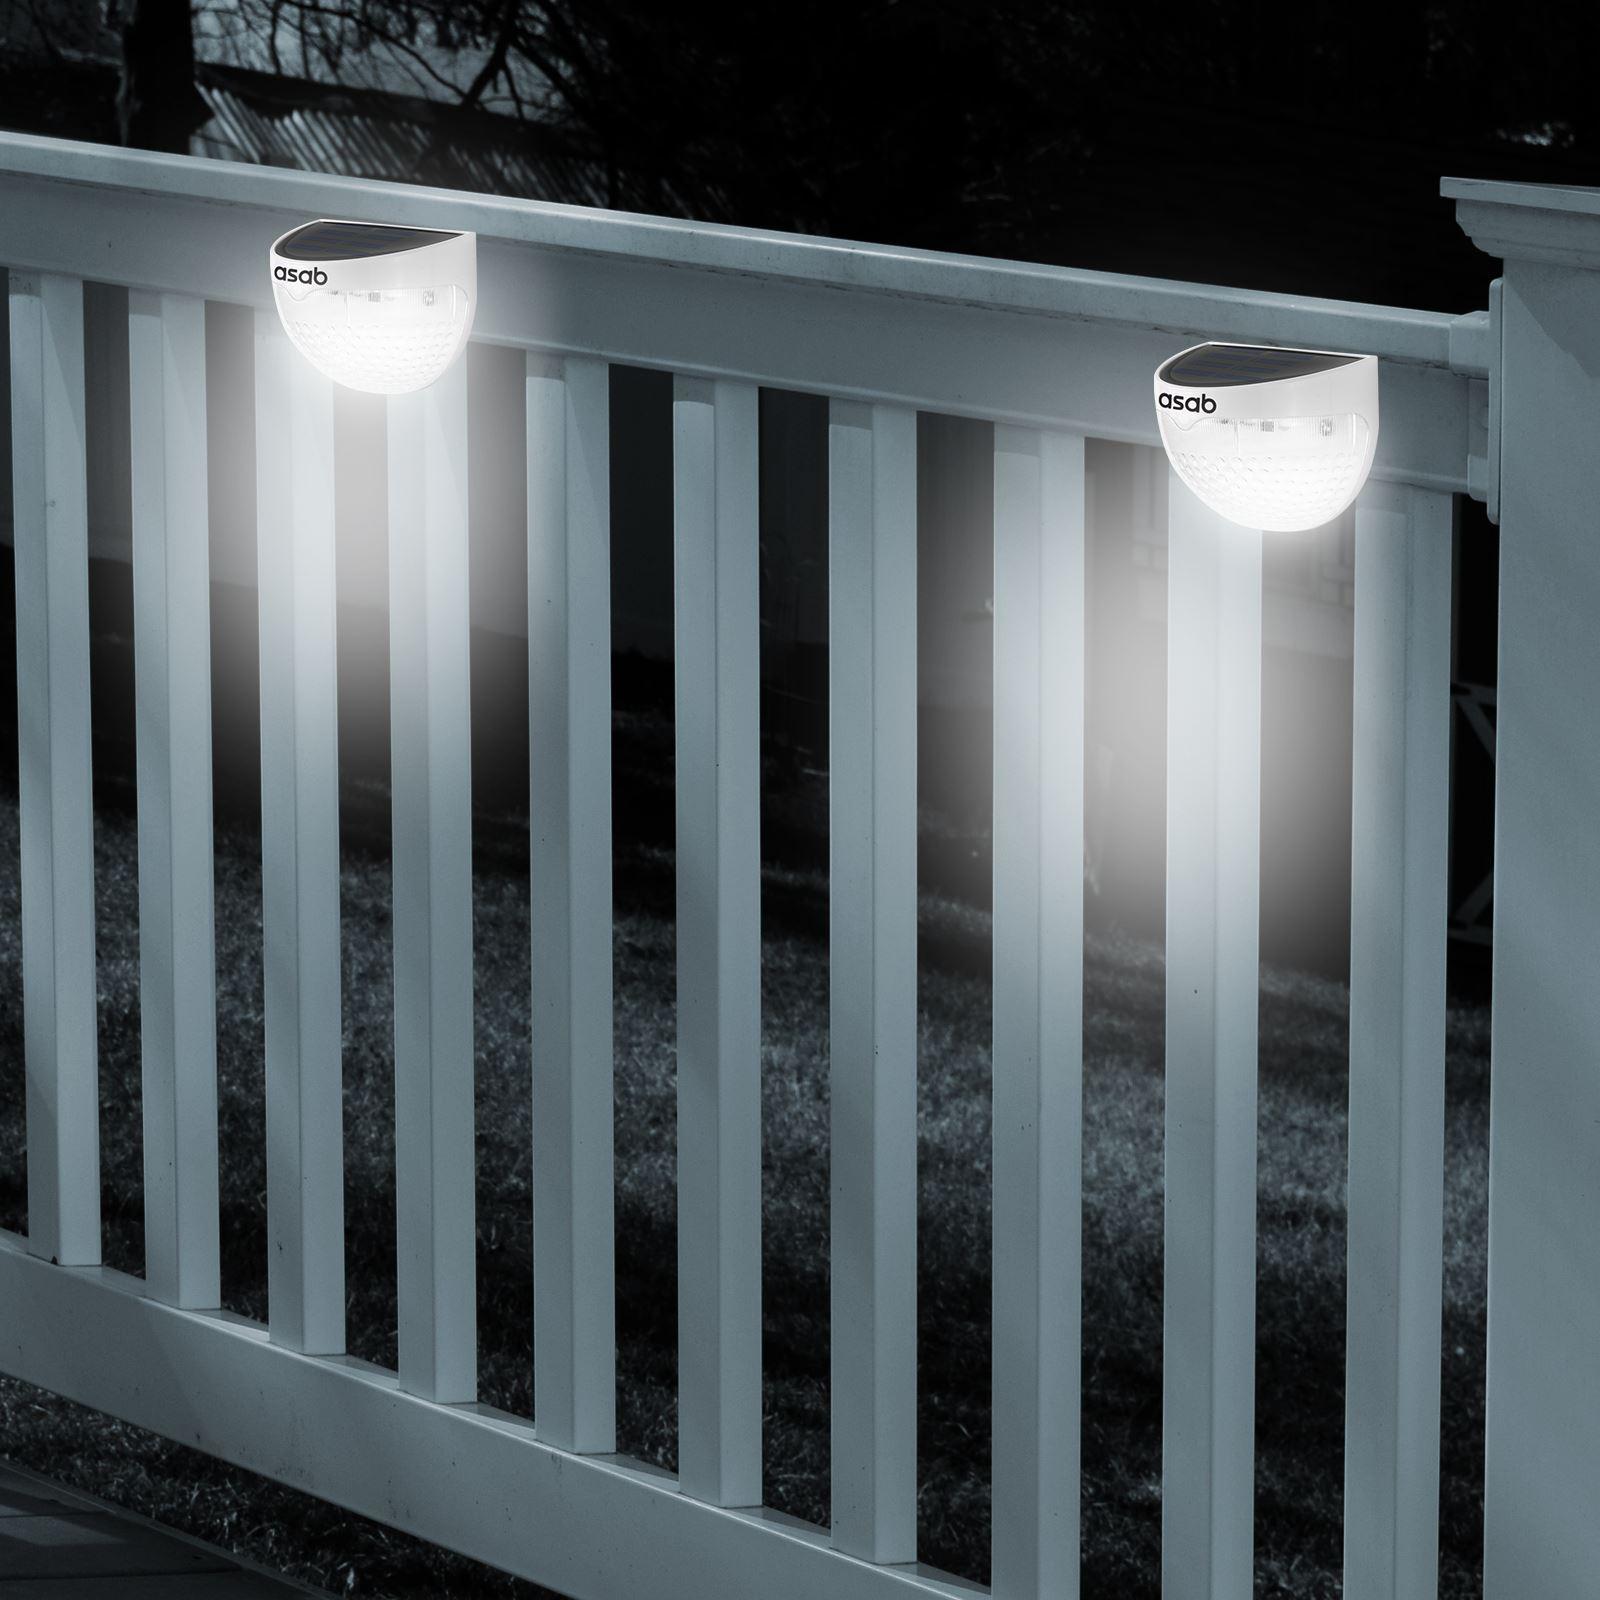 Solar Powered Fence Light LED Dual Path Gutter Lamp Wall Lighting Garden Outdoor